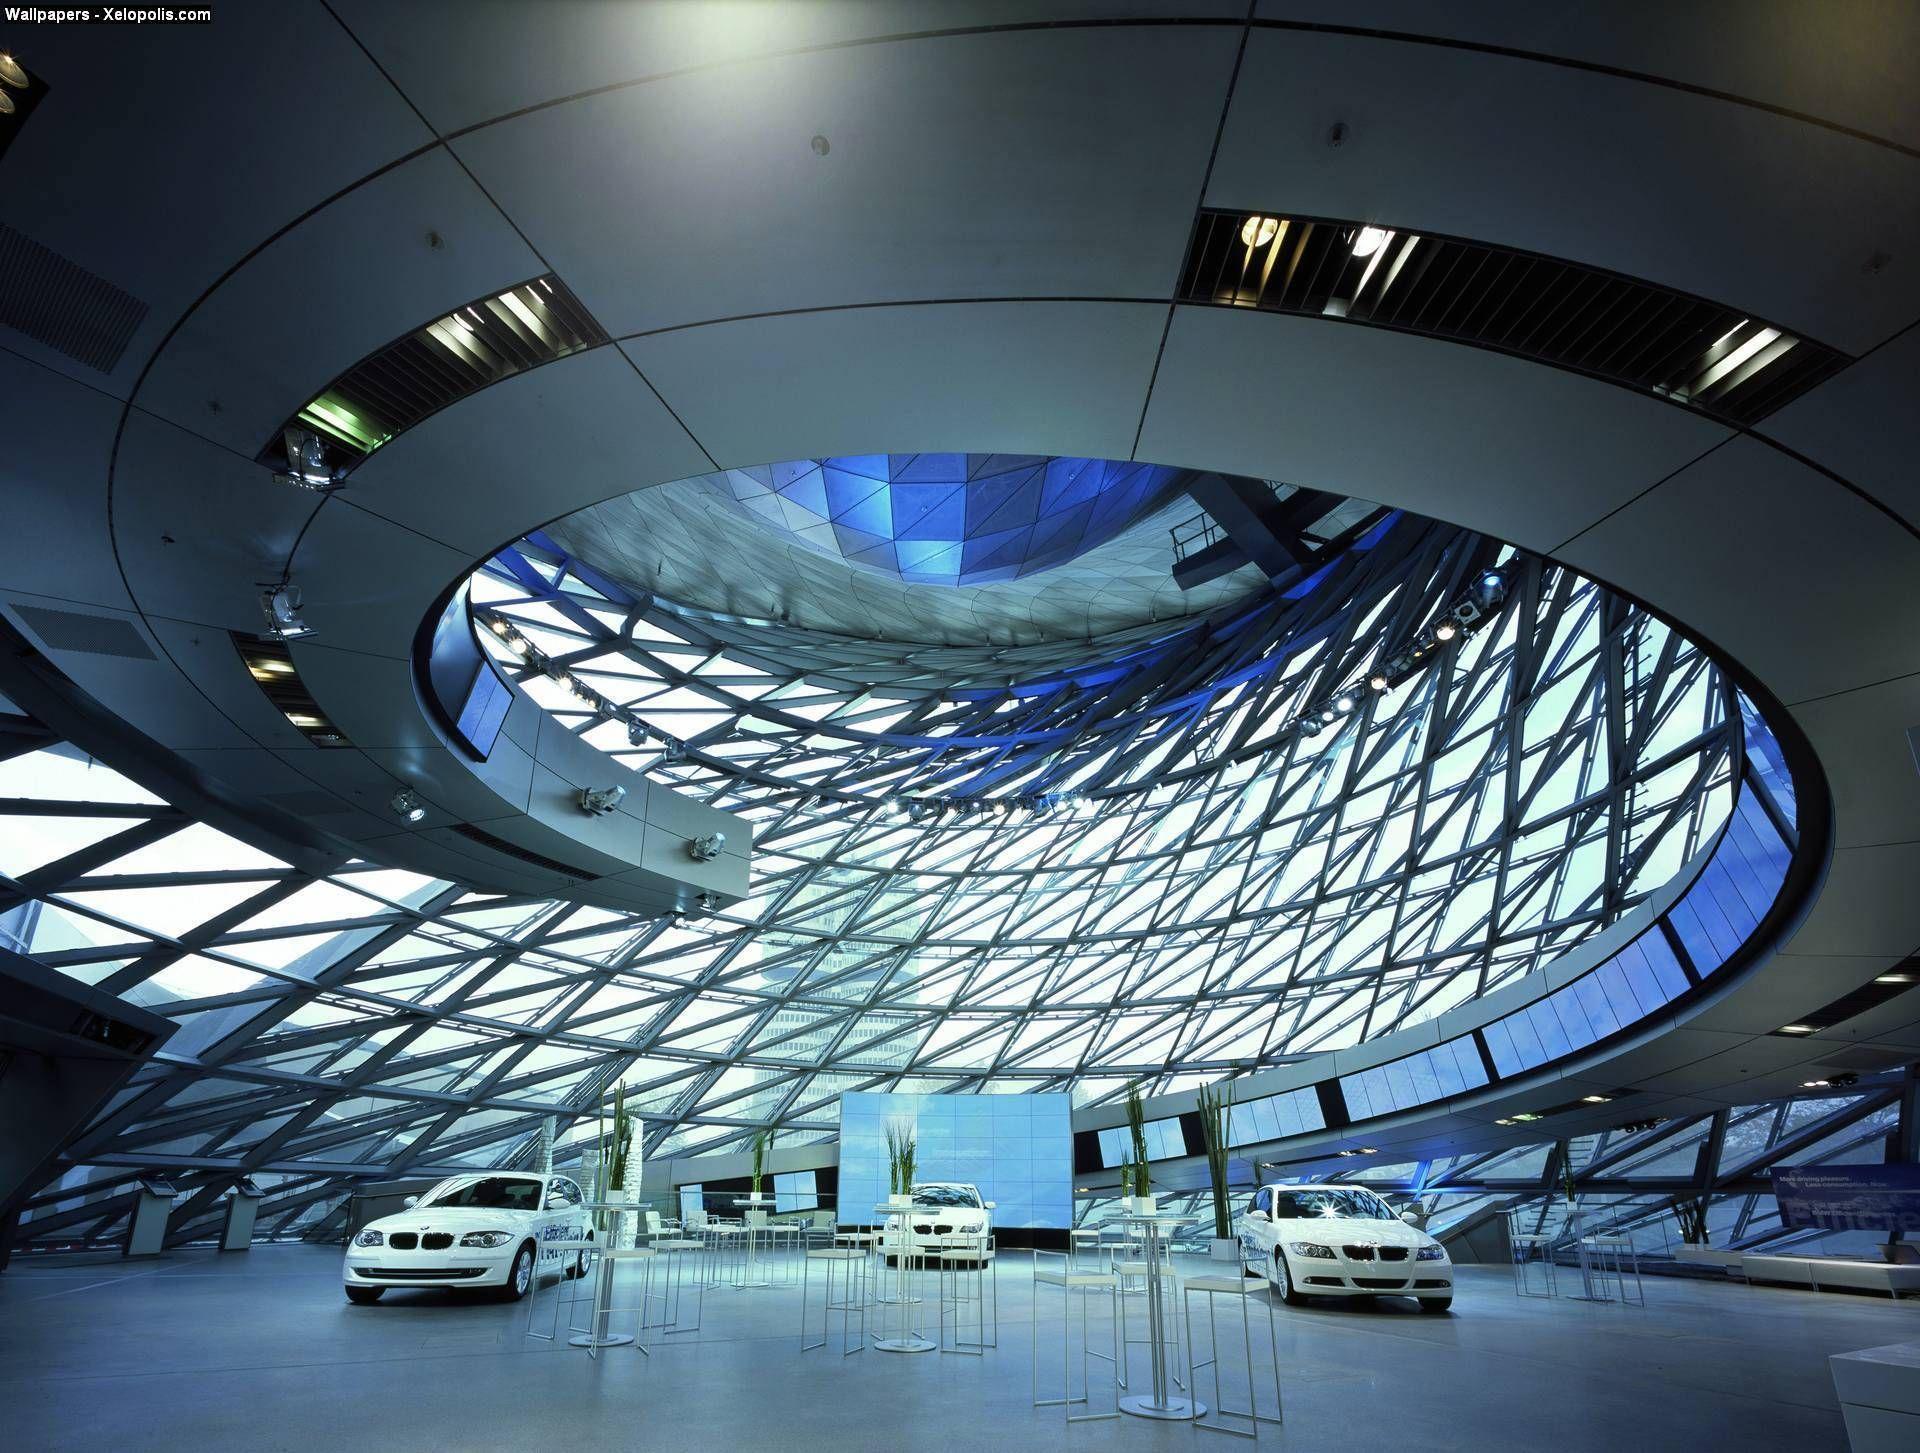 Centro Bmw Leipzig Zaha Hadid Modern Architecture